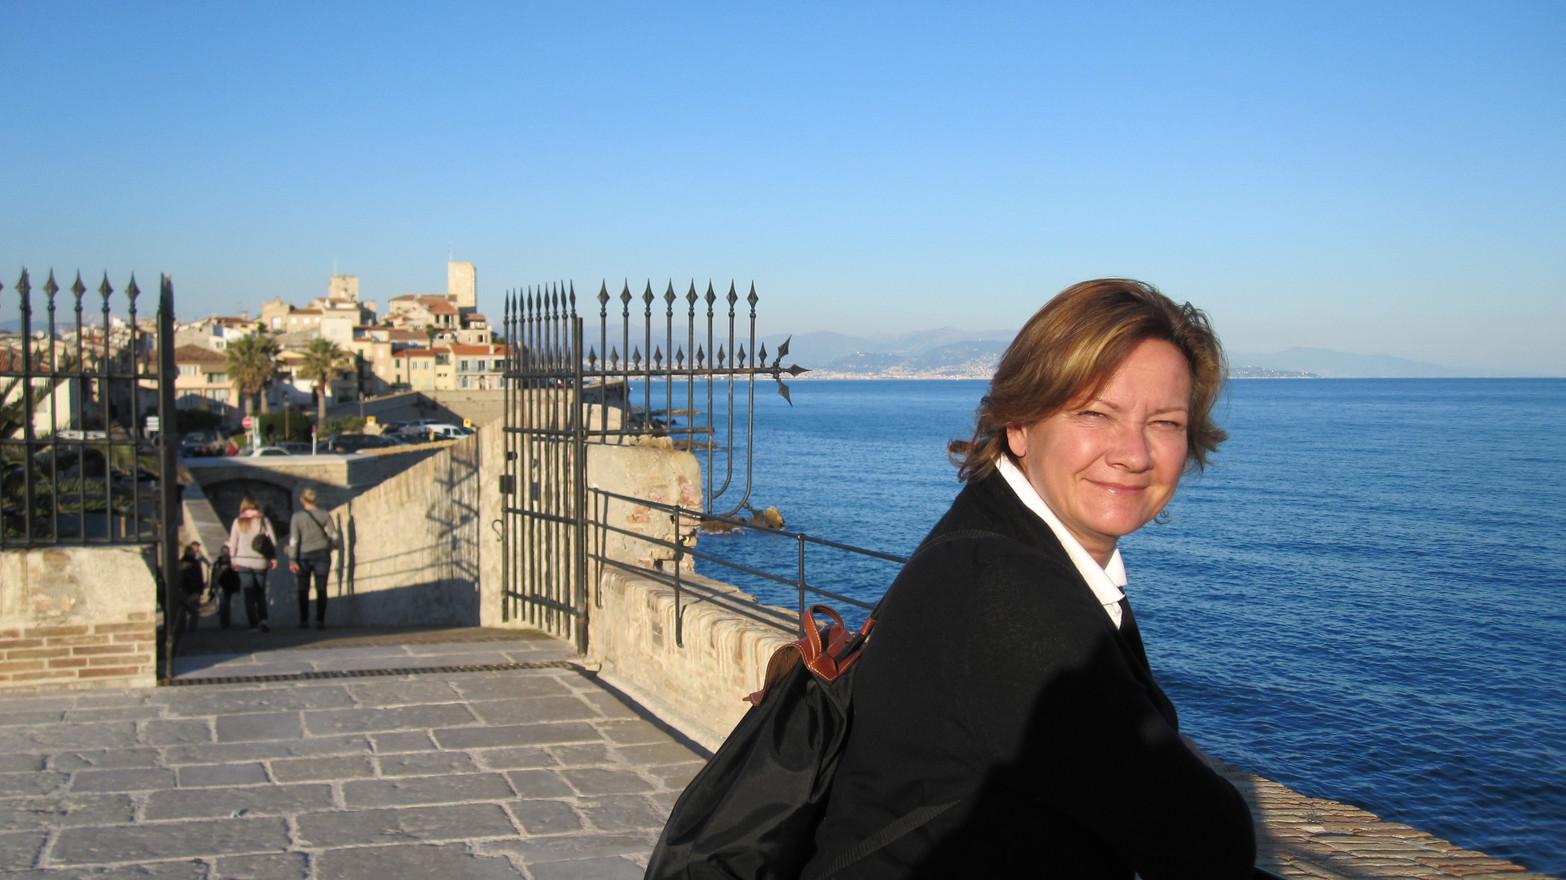 Maria i Antibes. År 2012.